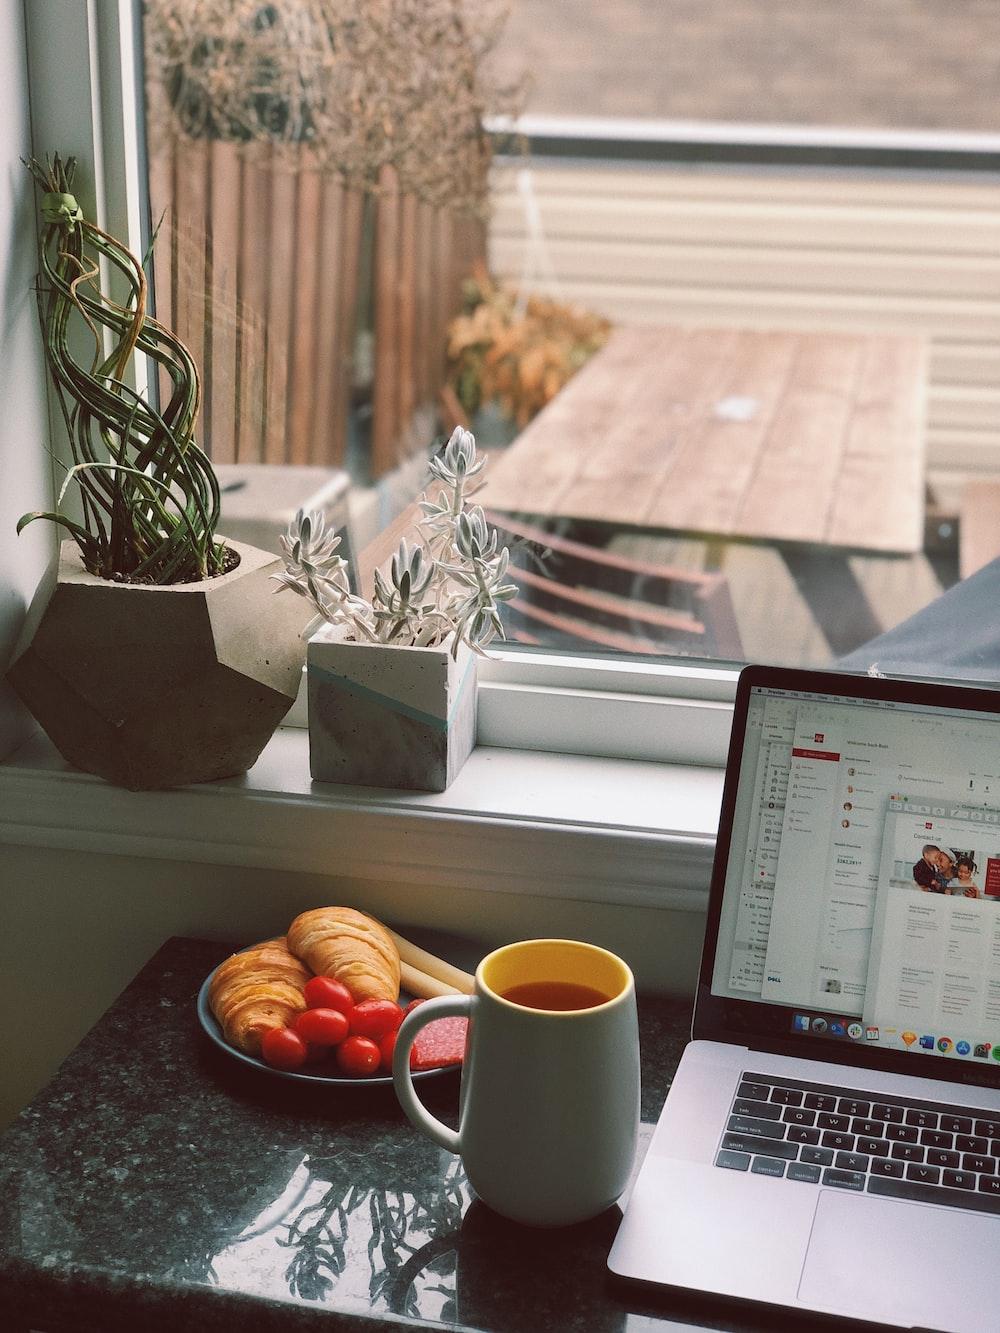 mug beside MacBook